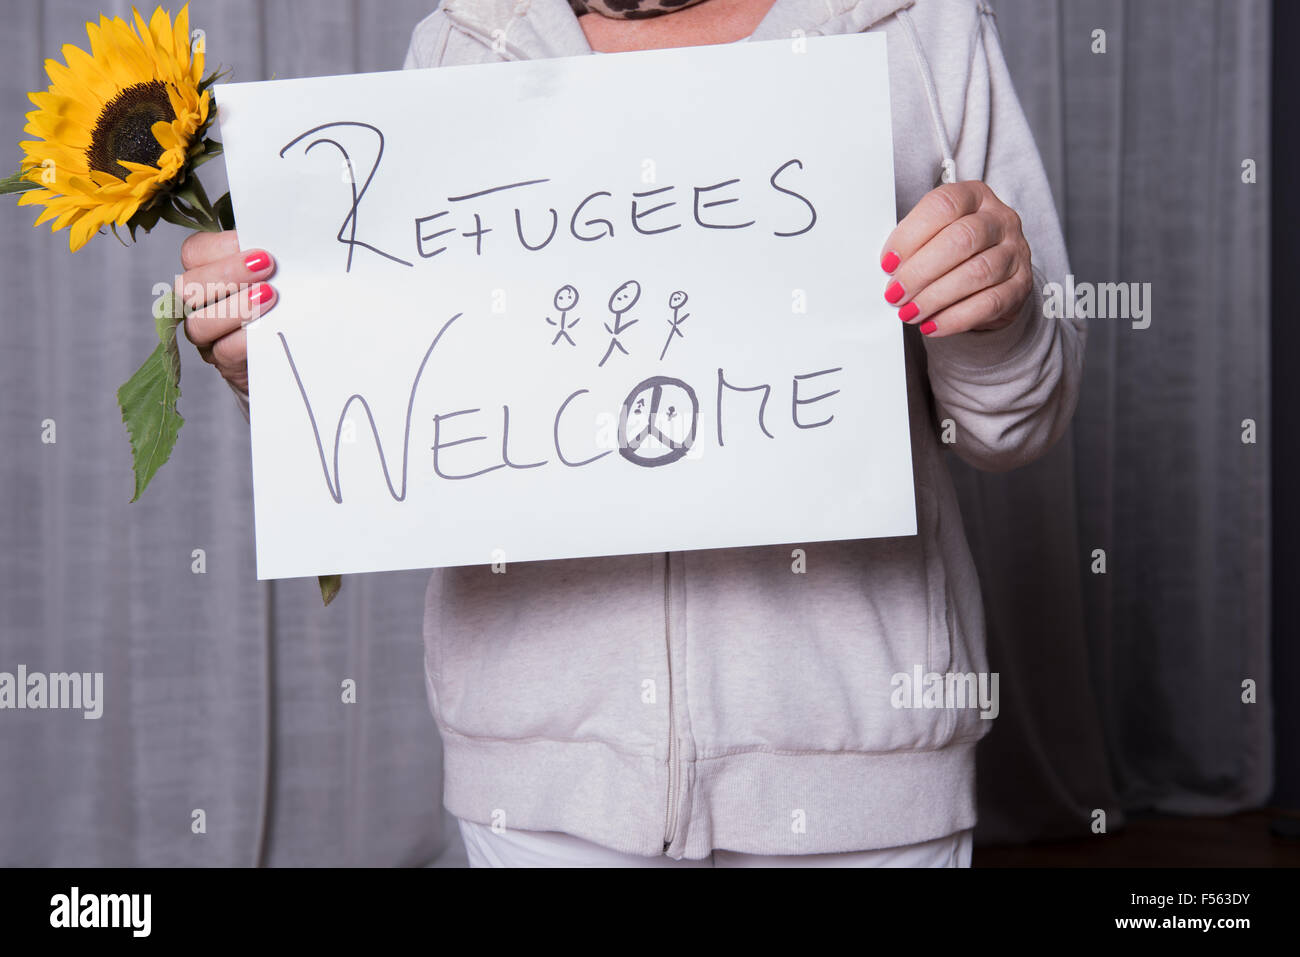 female helper welcomes refugees - Stock Image